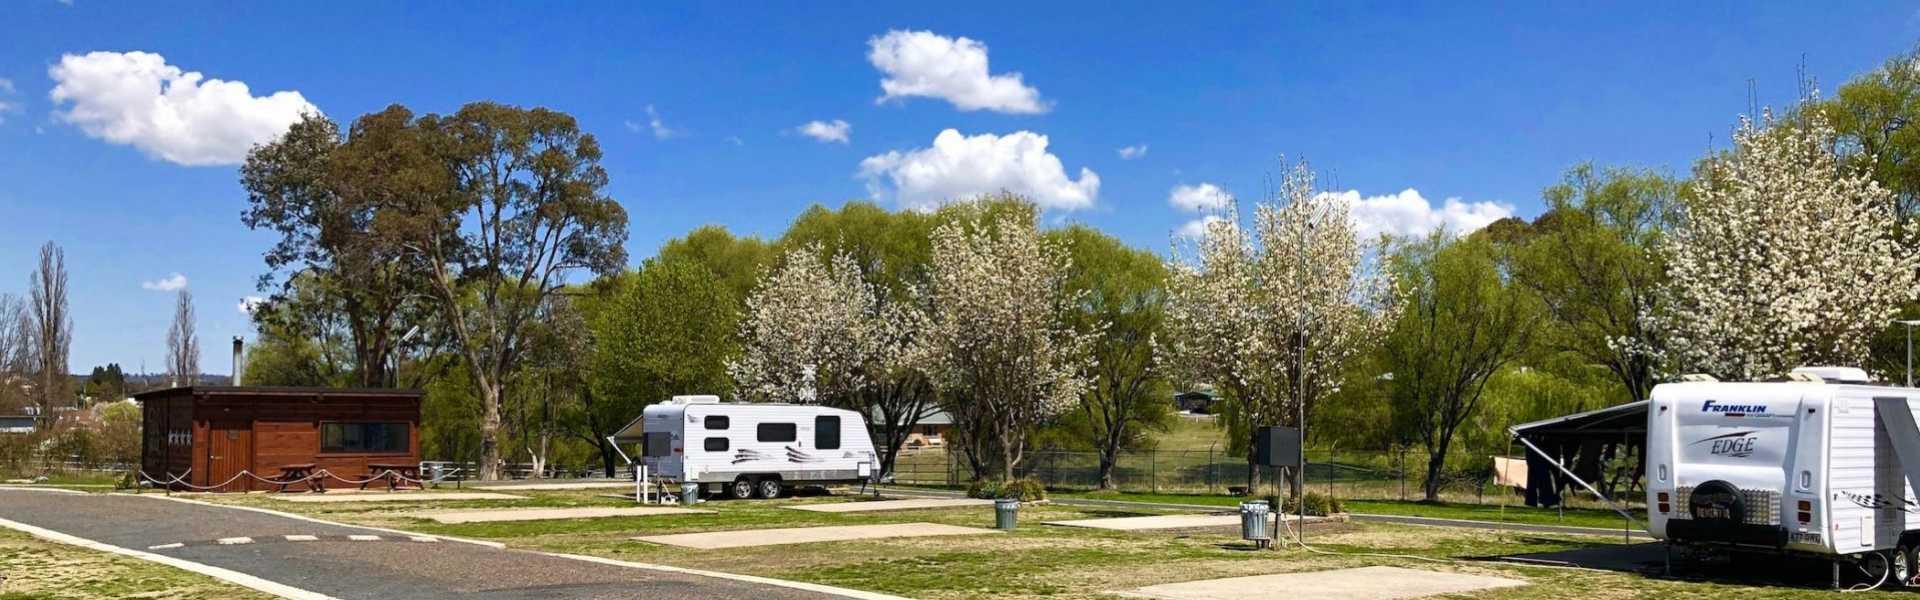 Walcha Caravan Park, Kui Parks, Walcha, Sites